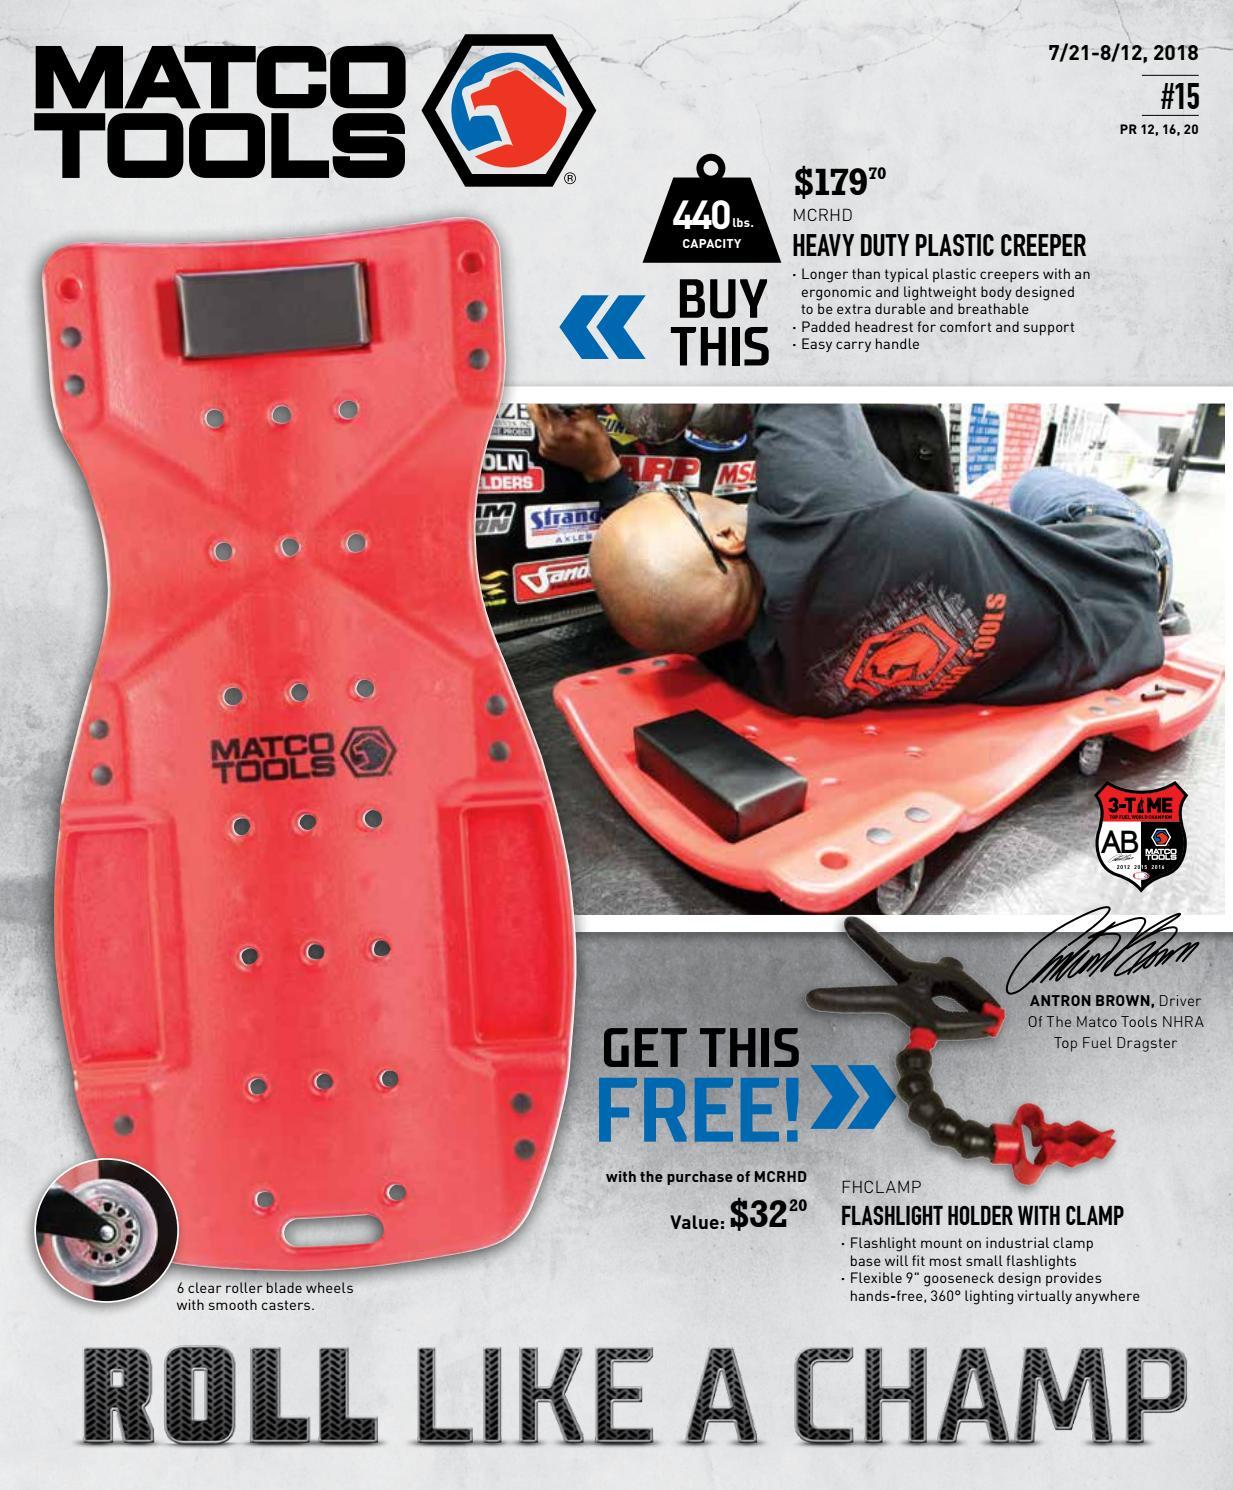 Matco Tools Flyer #15 by Dean Austin - issuu